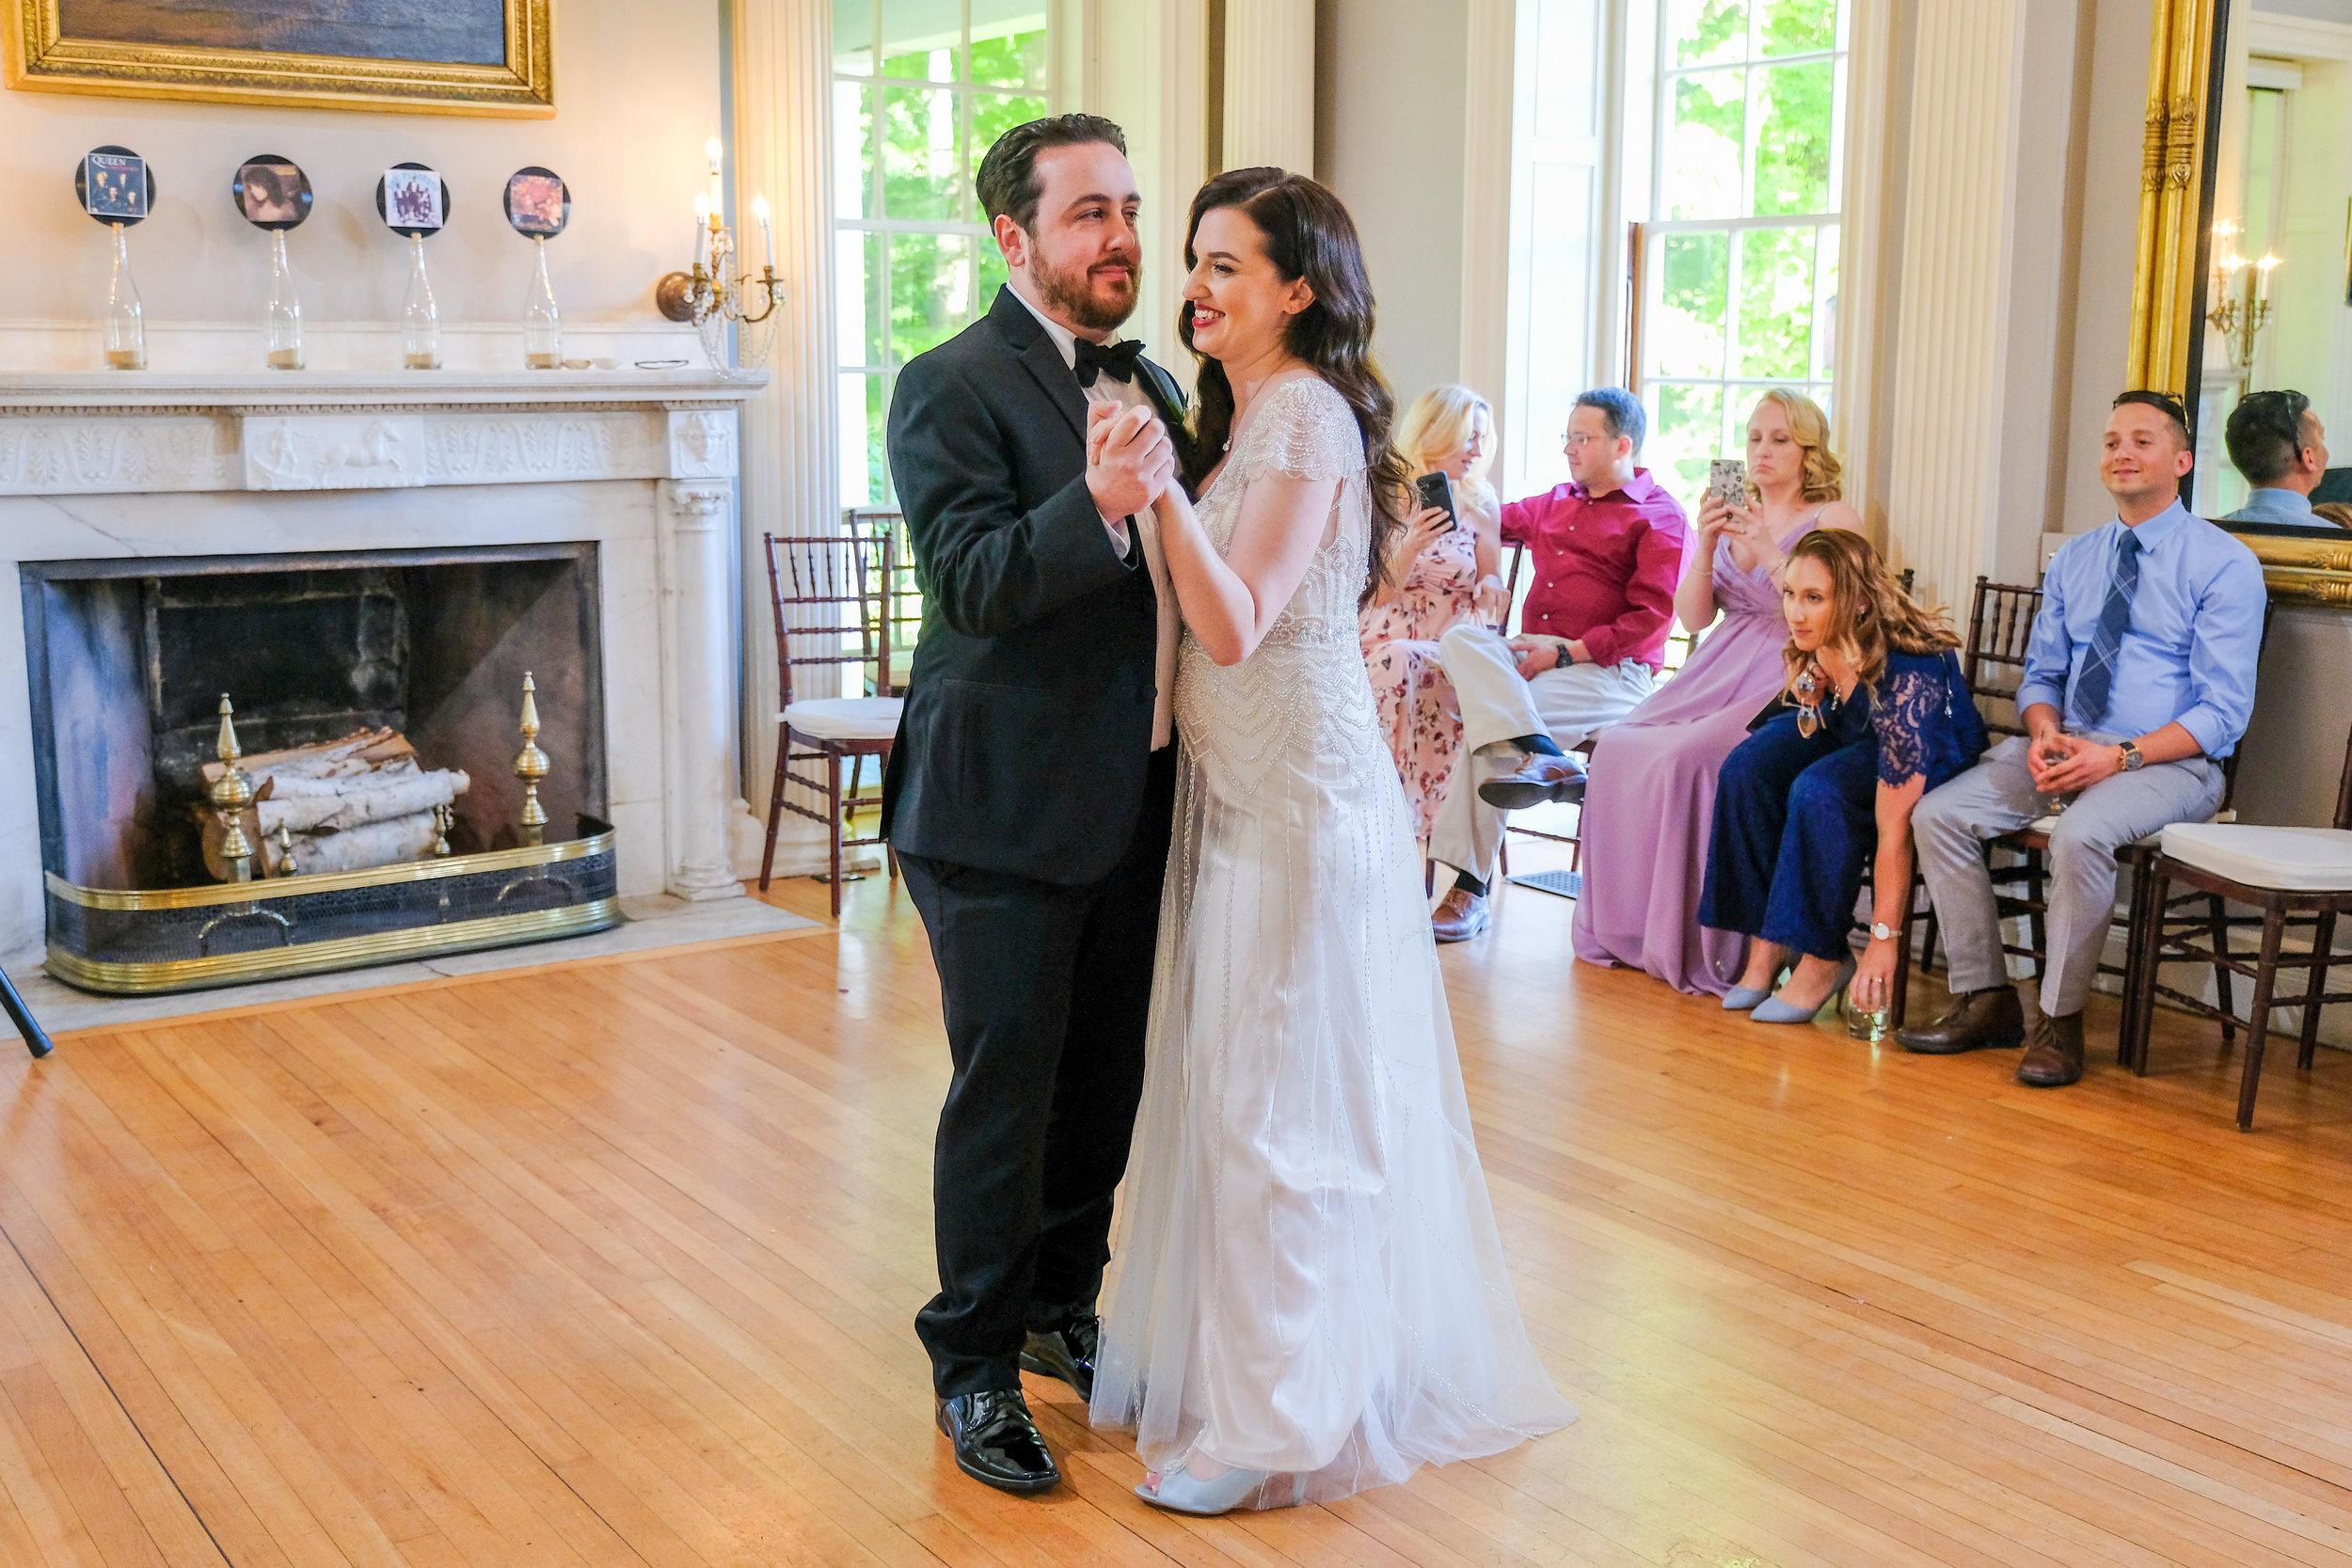 lyman-estate-wedding-photography-63.jpg